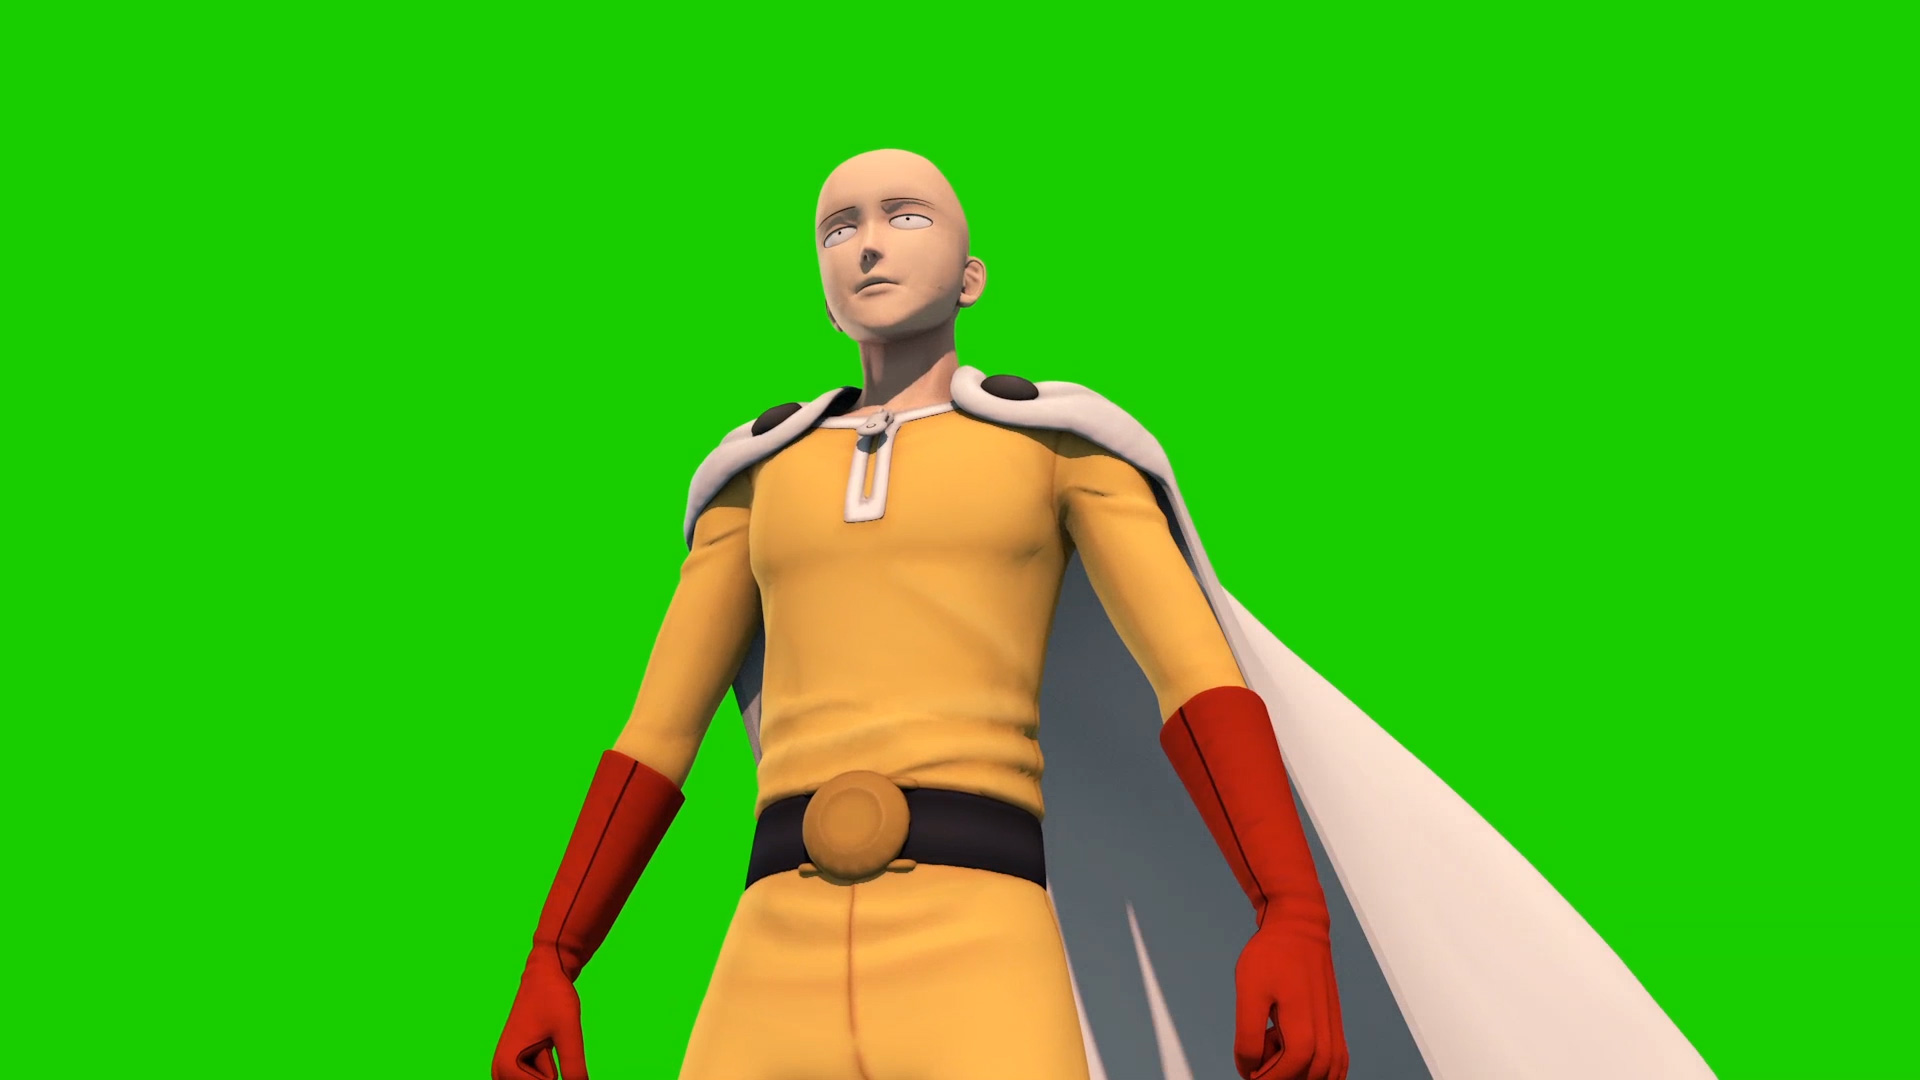 Saitama One Punch Man - 3D Animation - PixelBoom